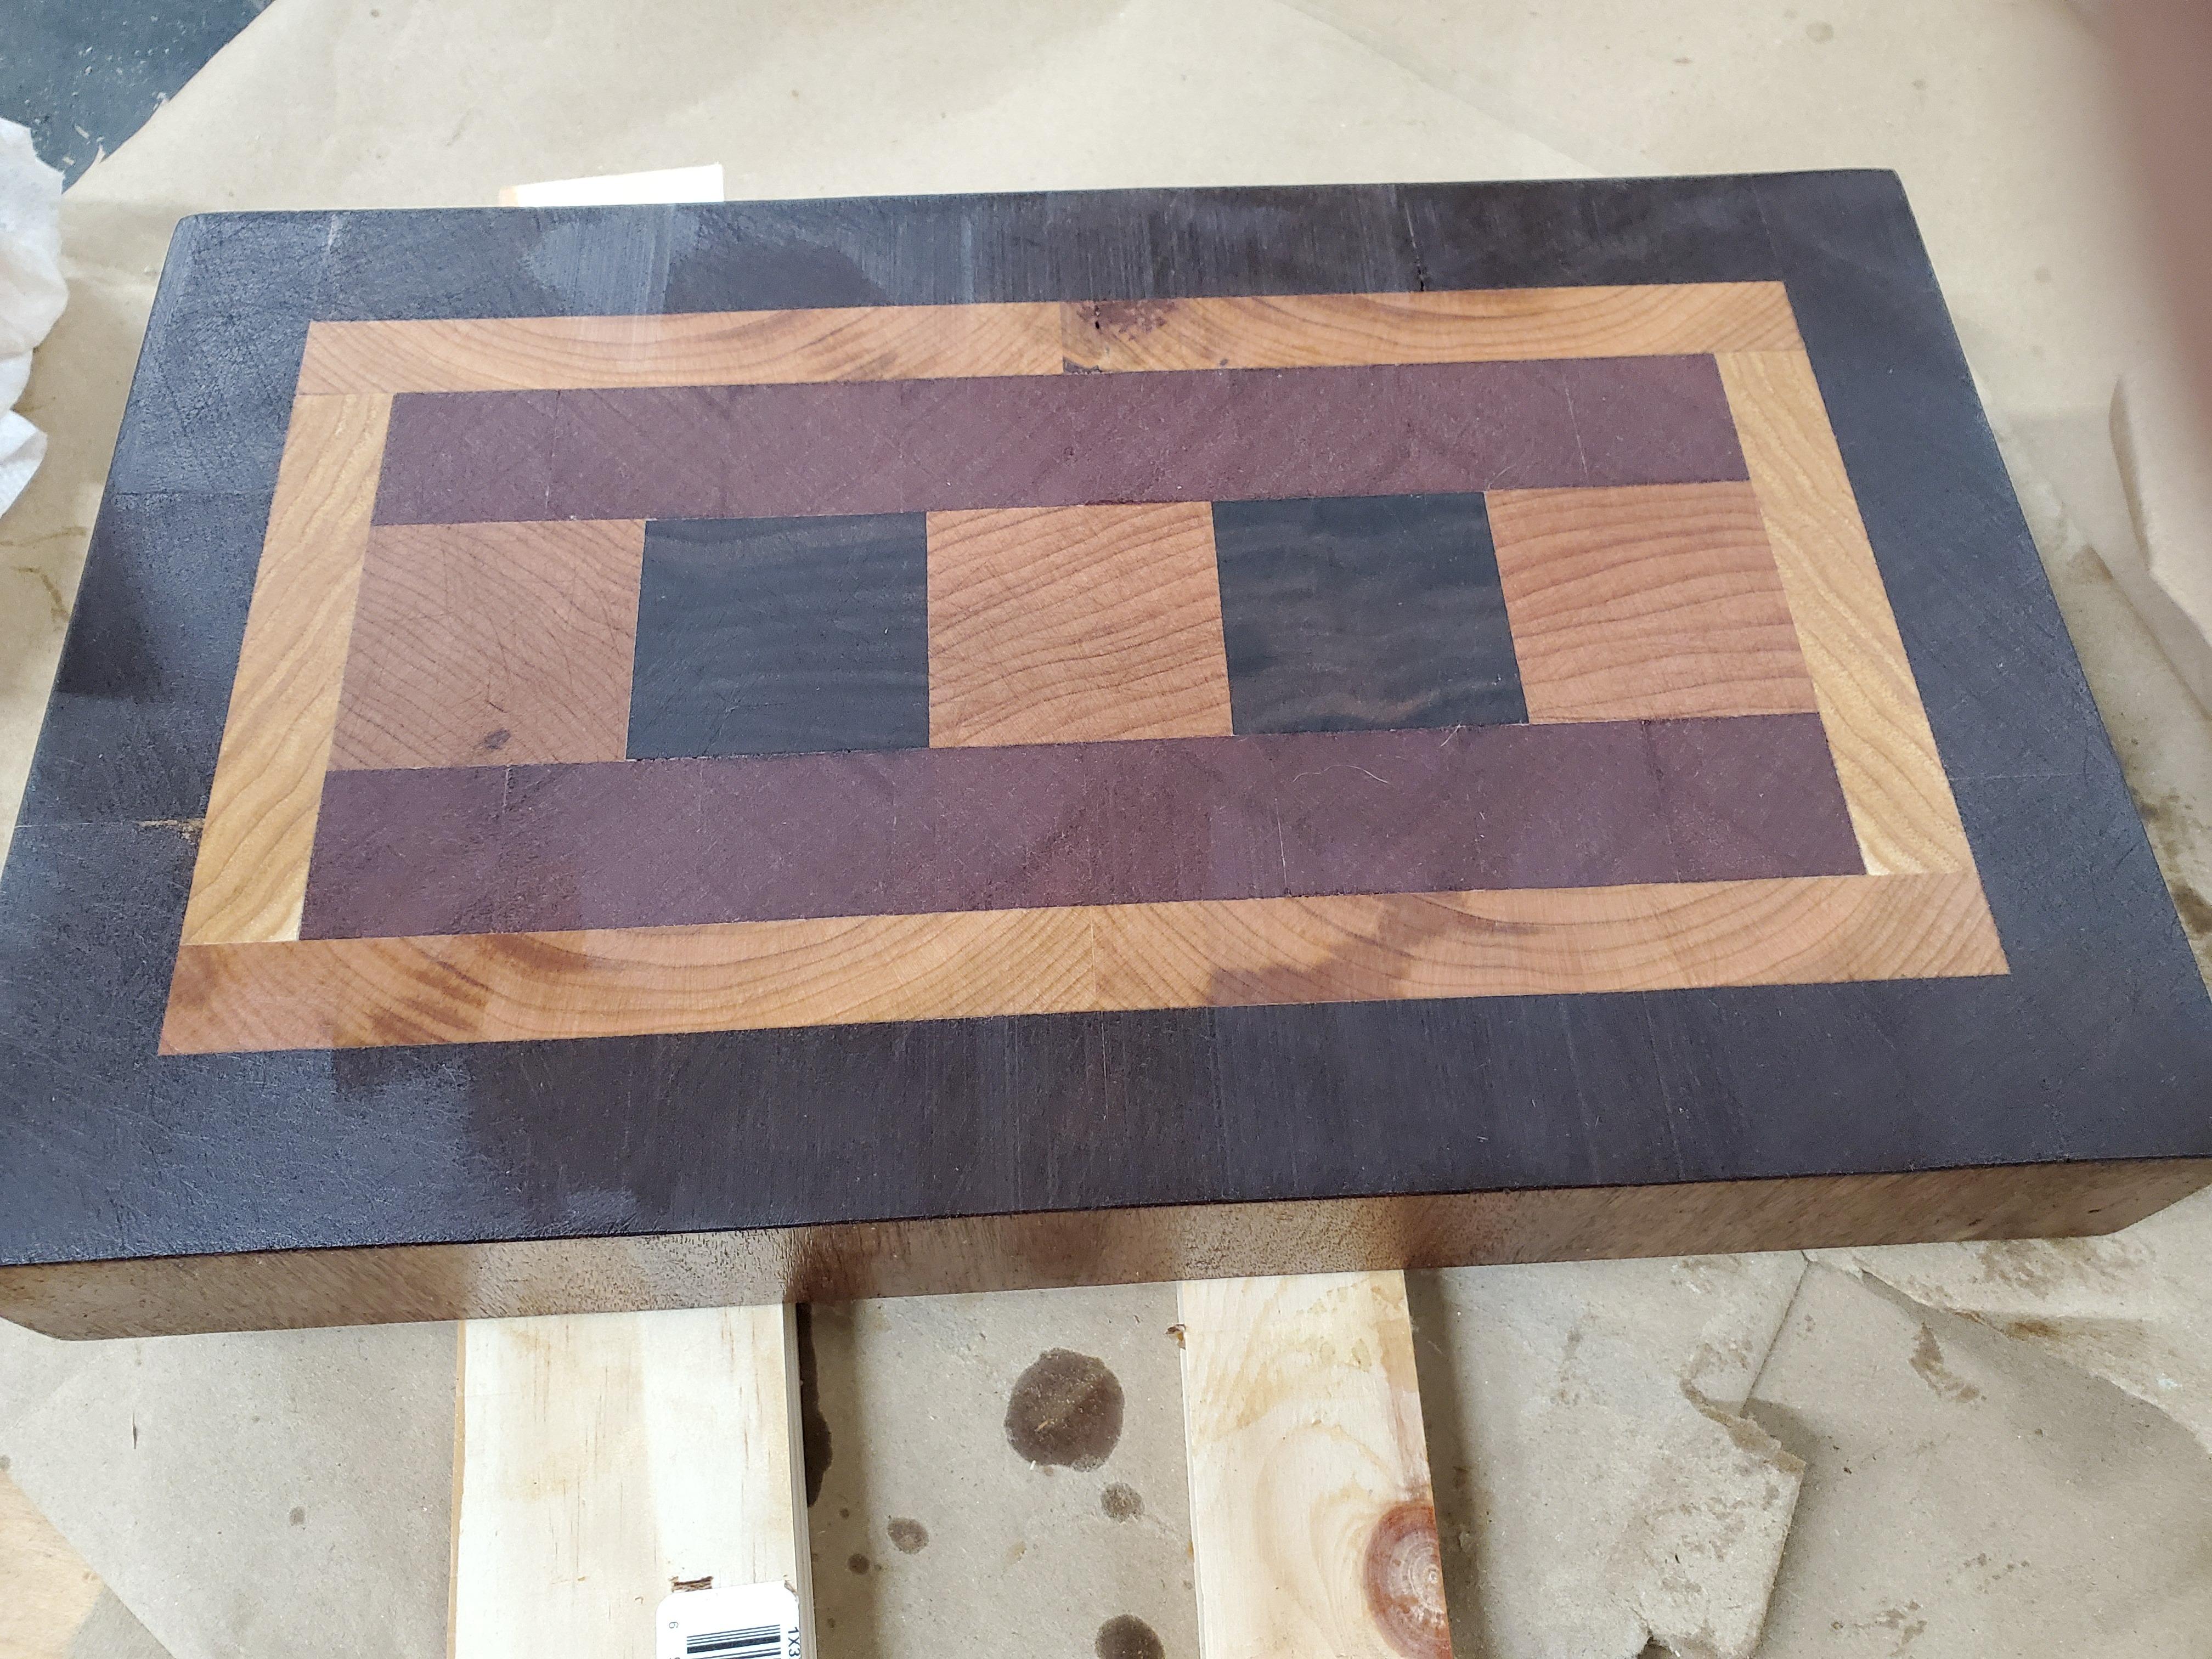 How to Make an End Grain Cutting Board